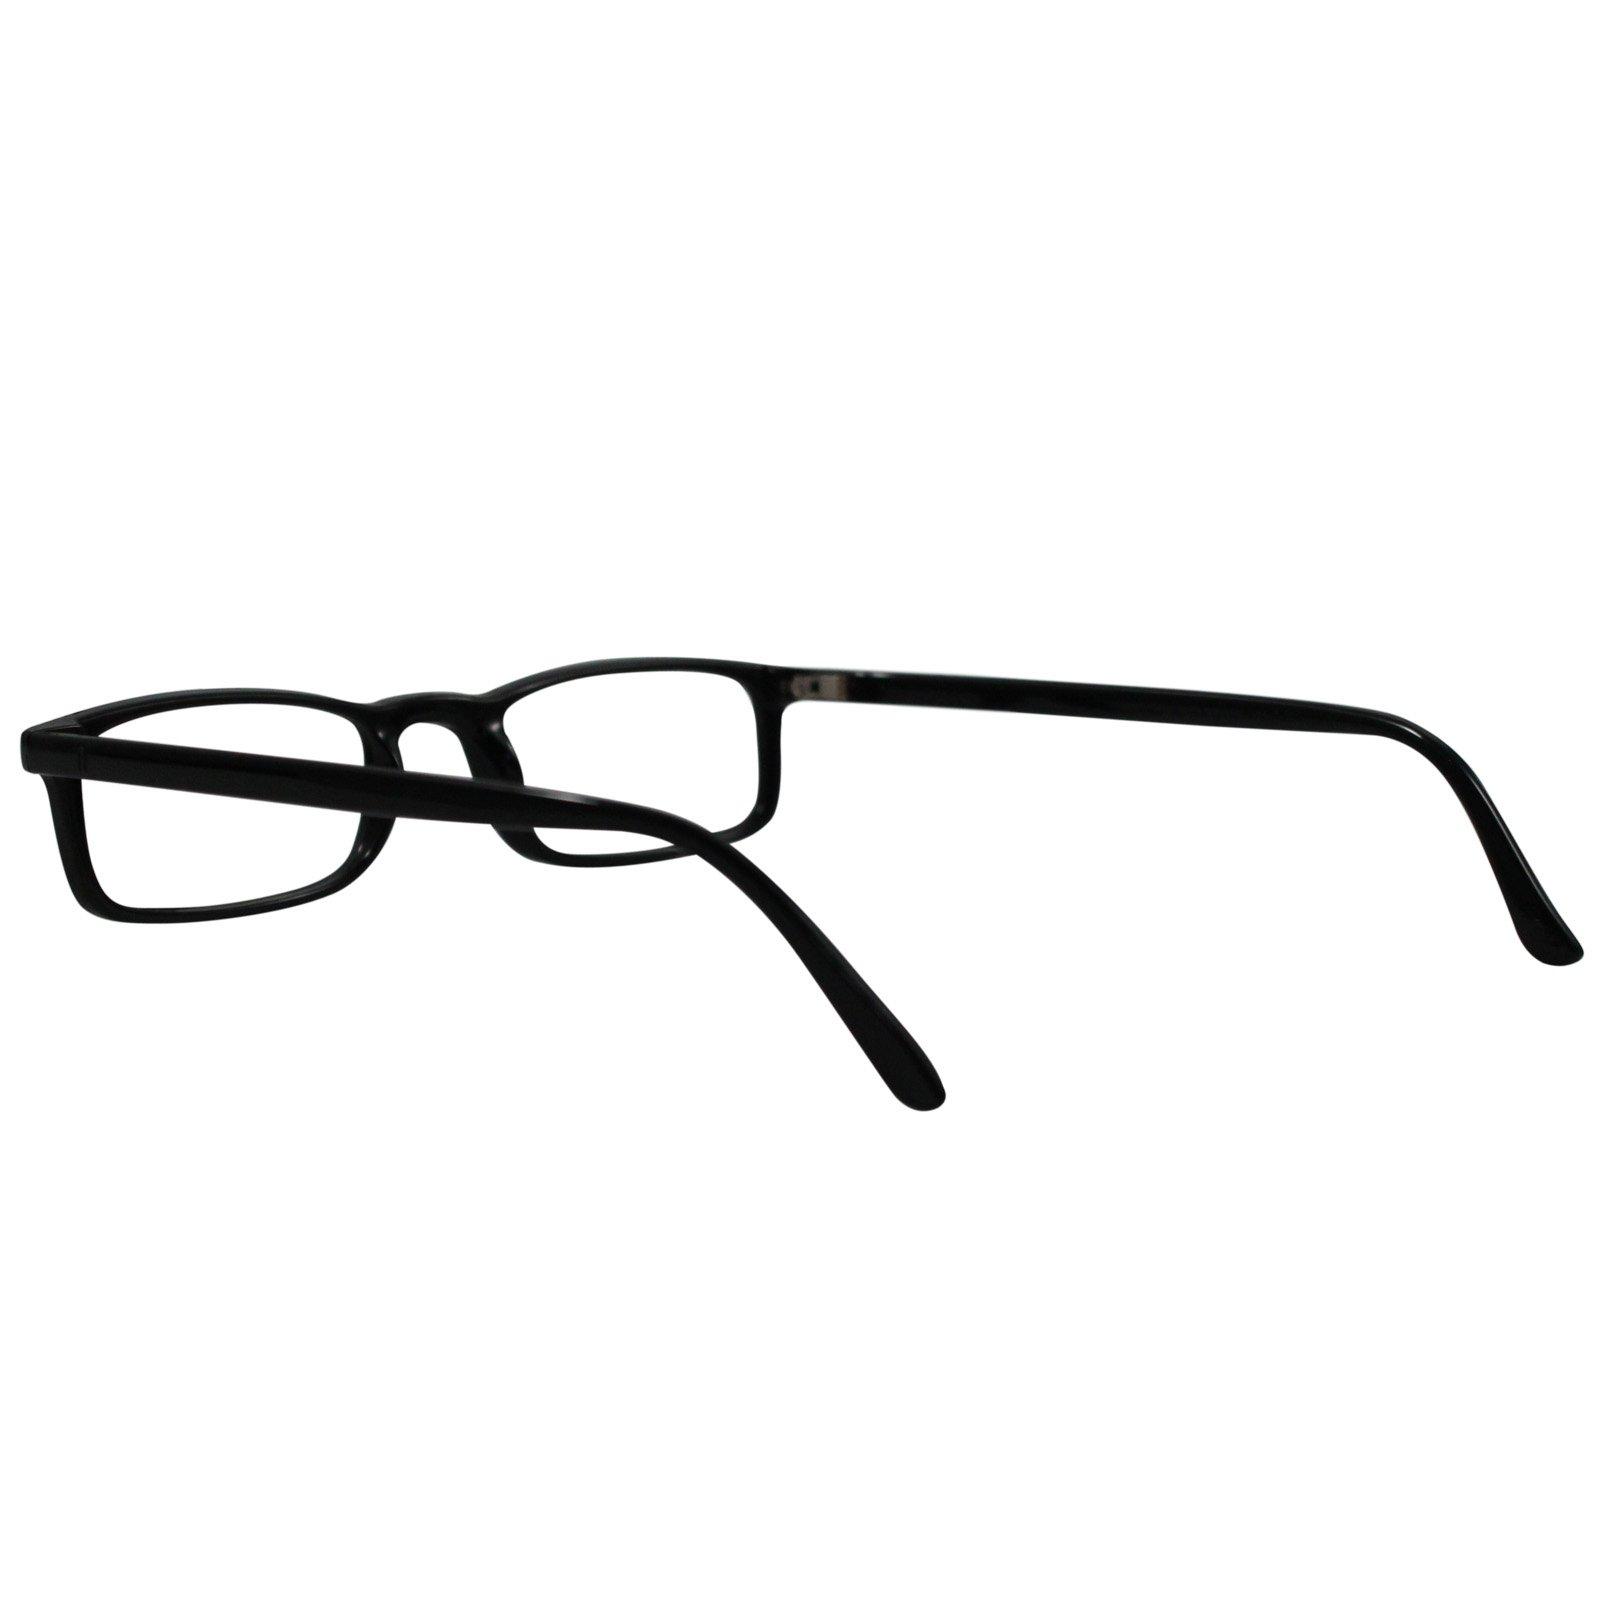 Reading Glasses Nannini Optics Vision Care Italian Fashion Readers - Black 3.0